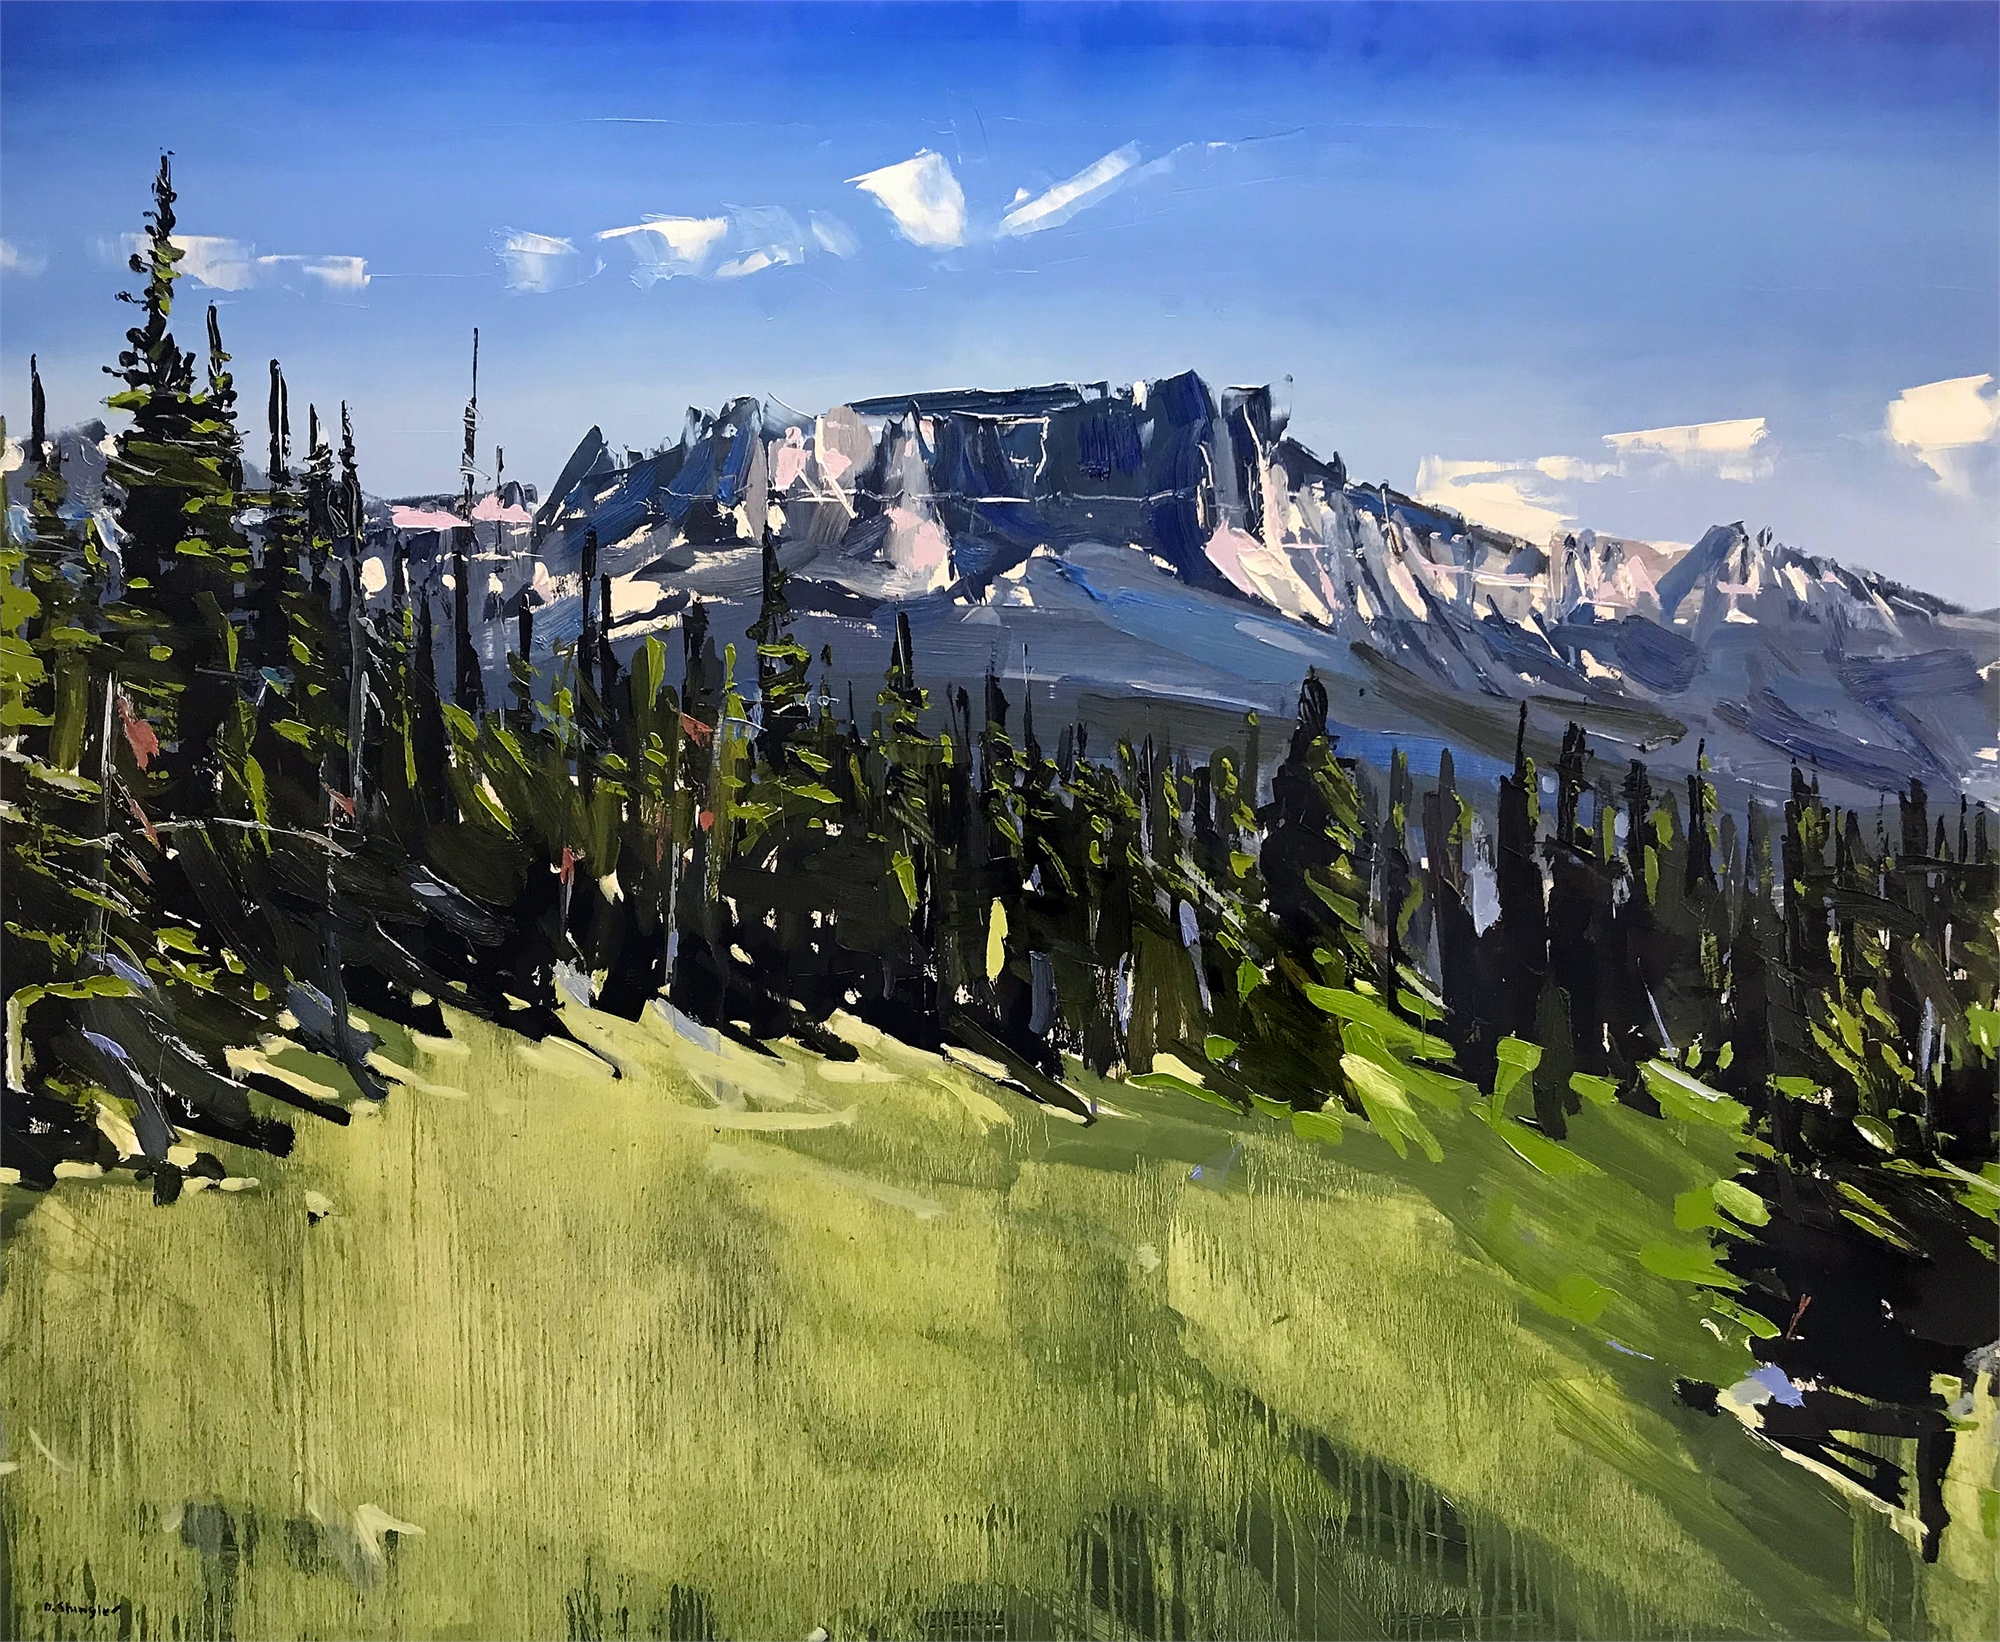 Grand Tetons National Park, WY by David Shingler